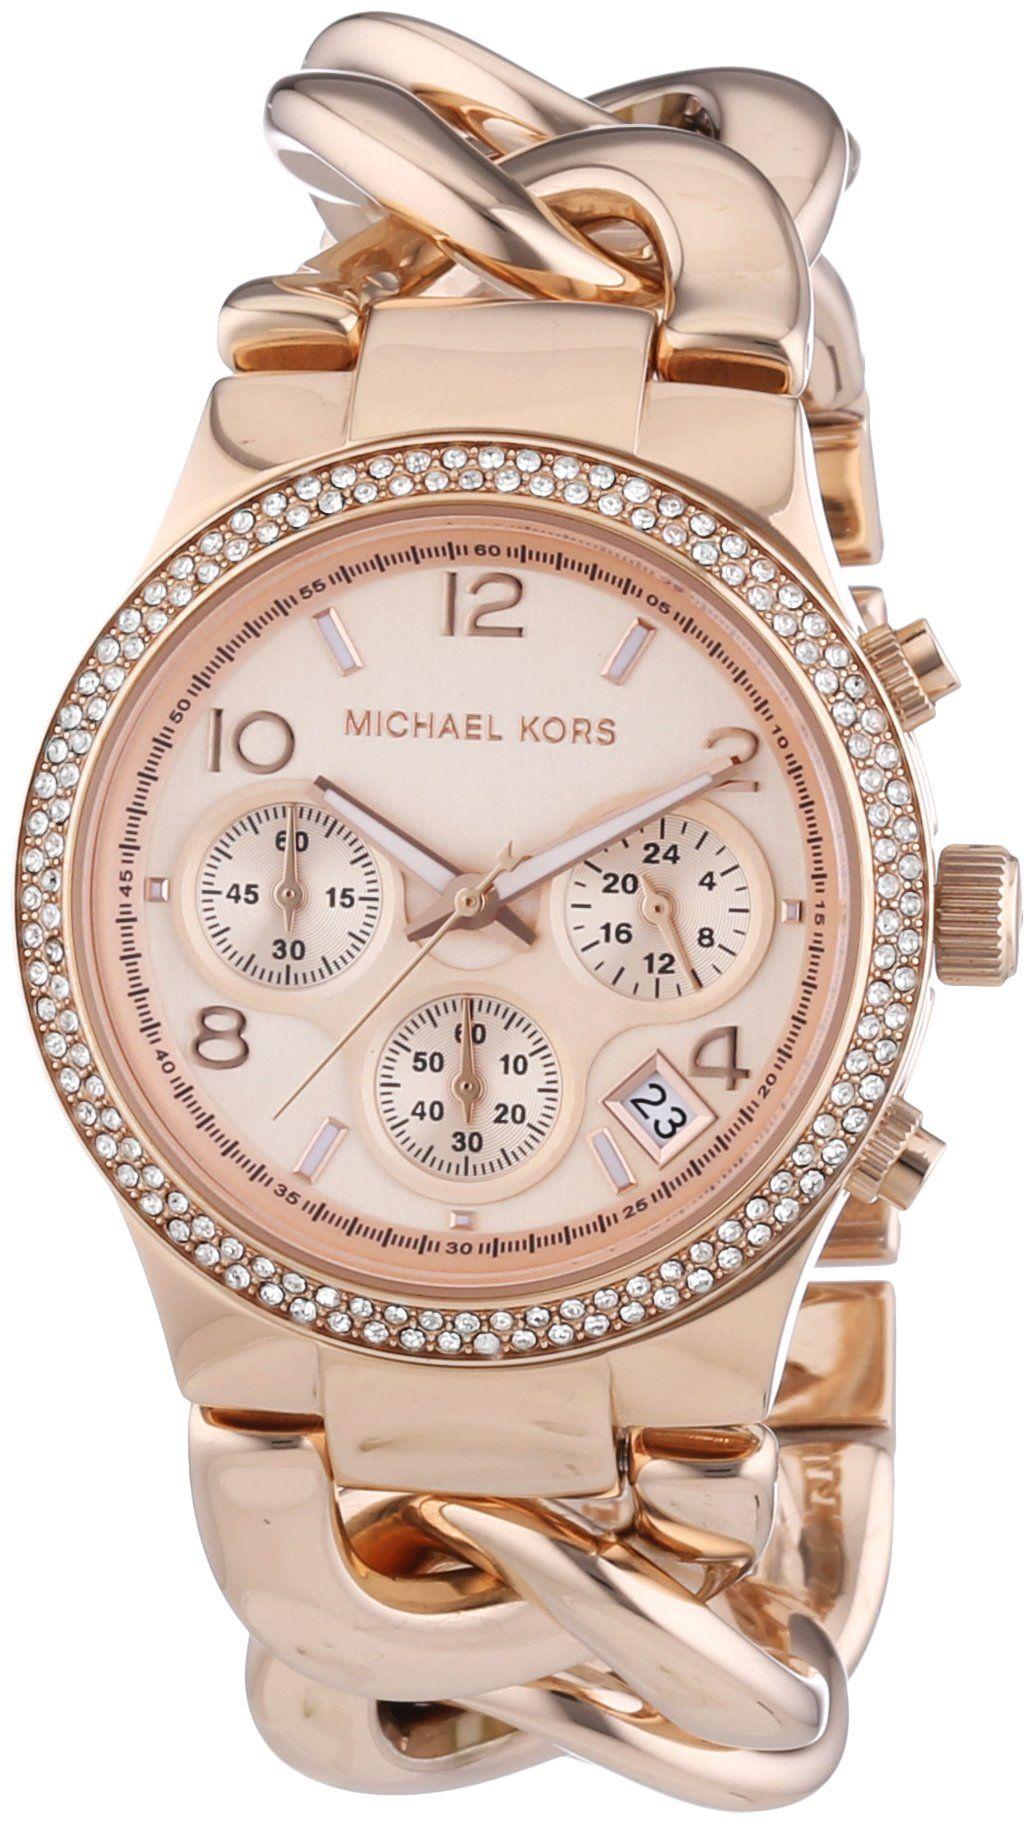 b7cac8bfbf66e Michael Kors Damen-Armbanduhr Chronograph Quarz Edelstahl beschichtet MK3247